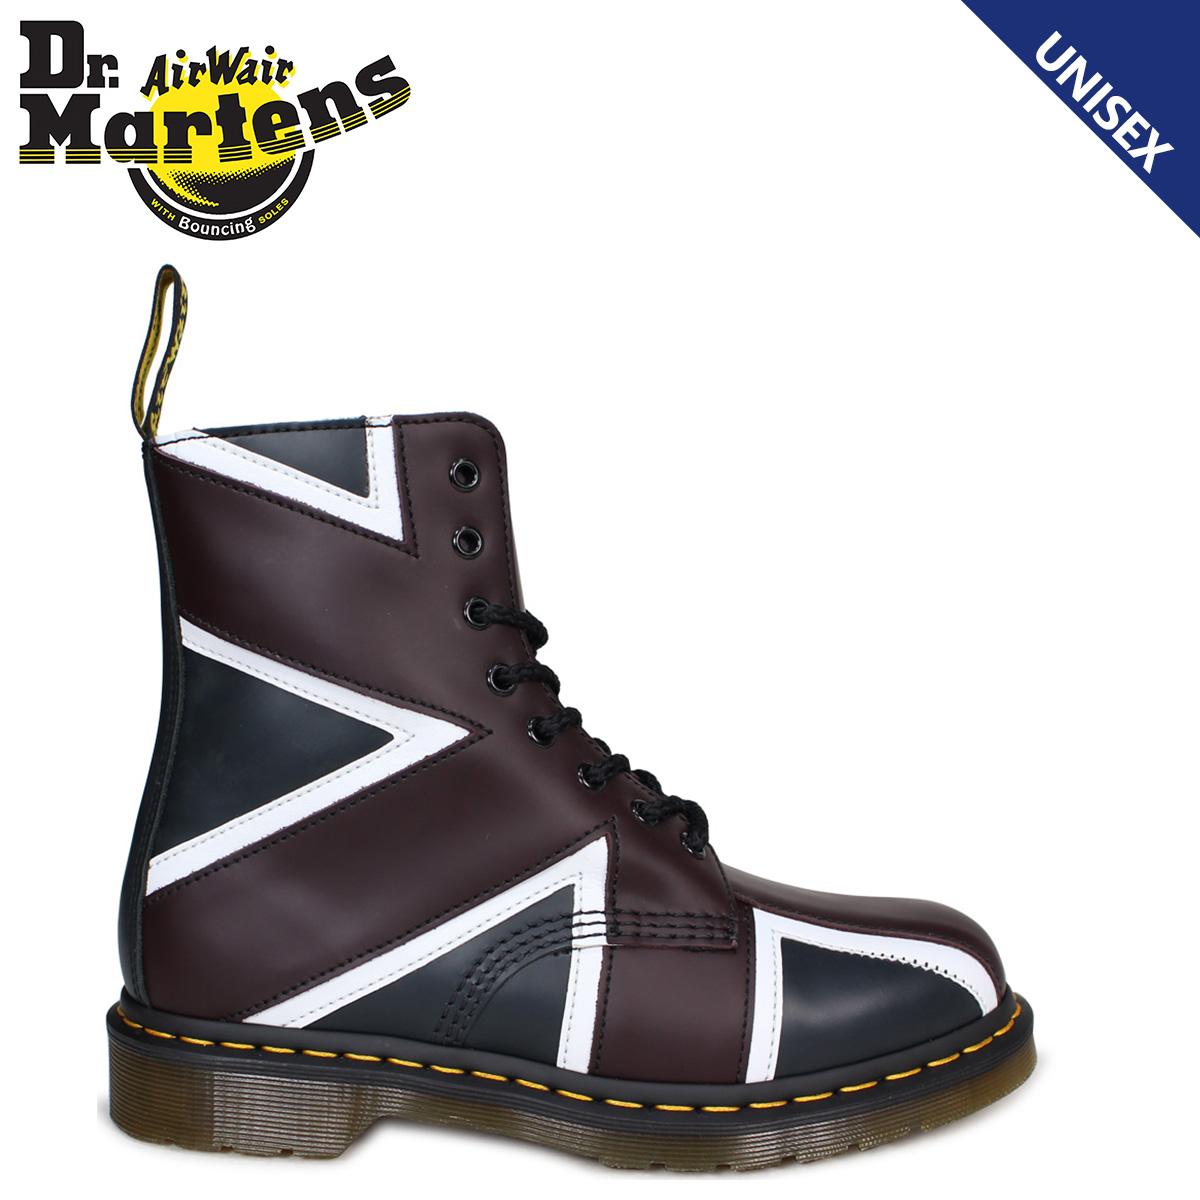 eceef0b966 Doctor Martin 8 hall men gap Dis Dr.Martens boots UNION JACK PASCAL BRIT 8  ...